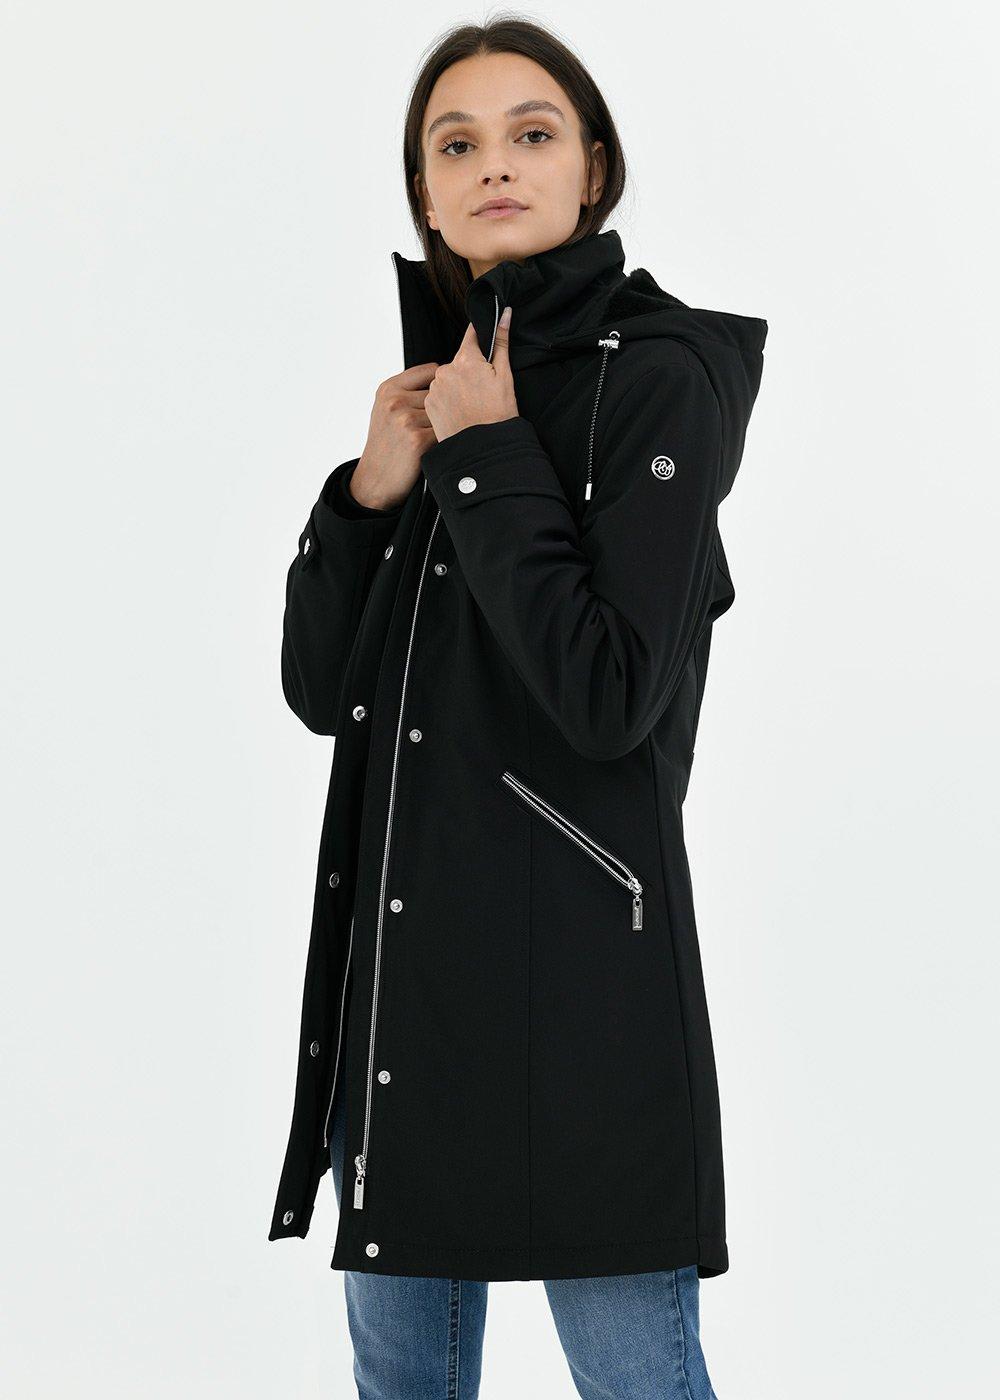 Piumino Pether tessuto tecnico - Black - Donna